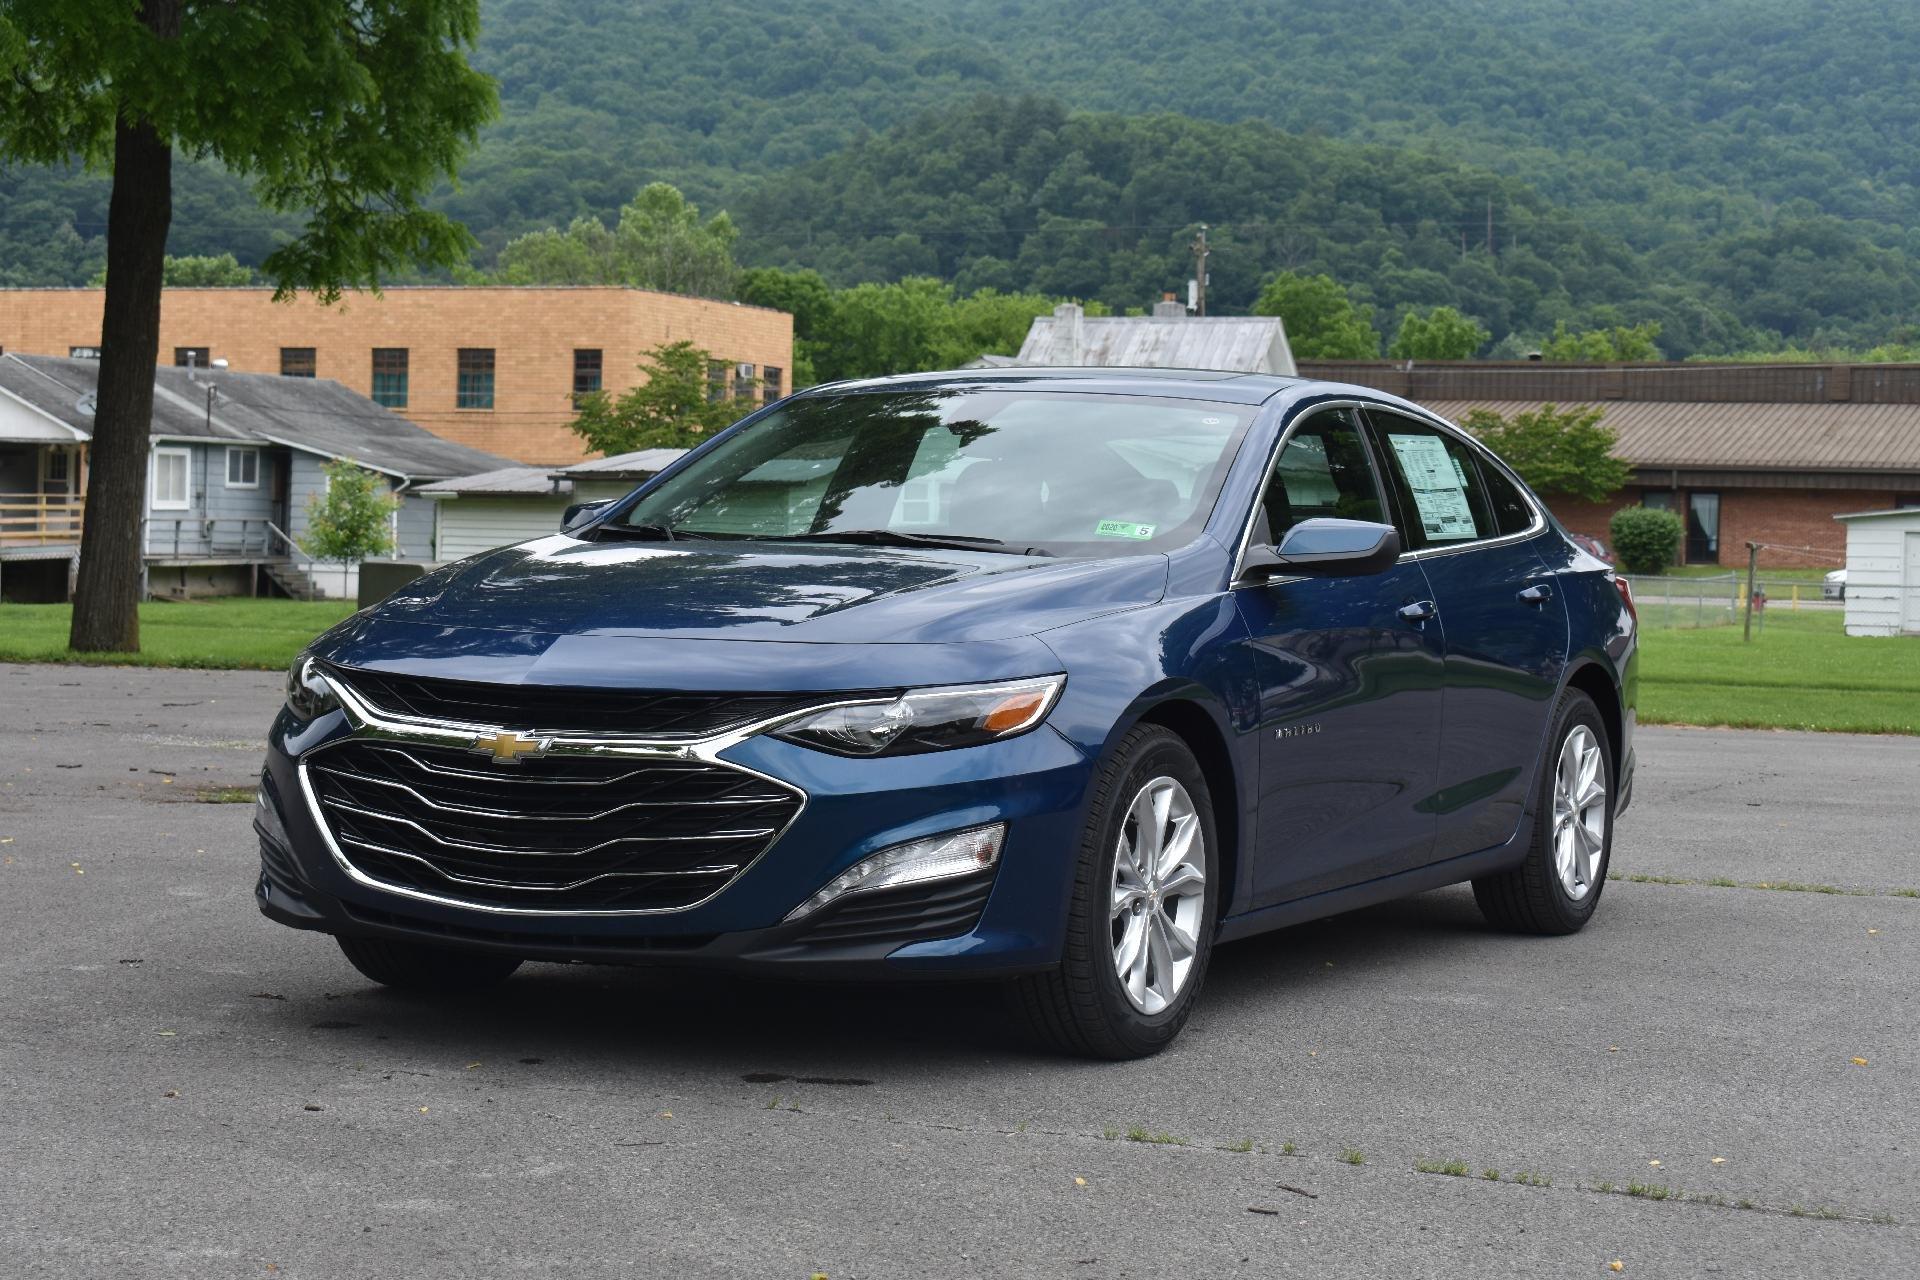 New 2019 Chevrolet-Malibu Premier Malibu Premier for sale $31,820 at M and V Leasing in Brooklyn NY 11223 1